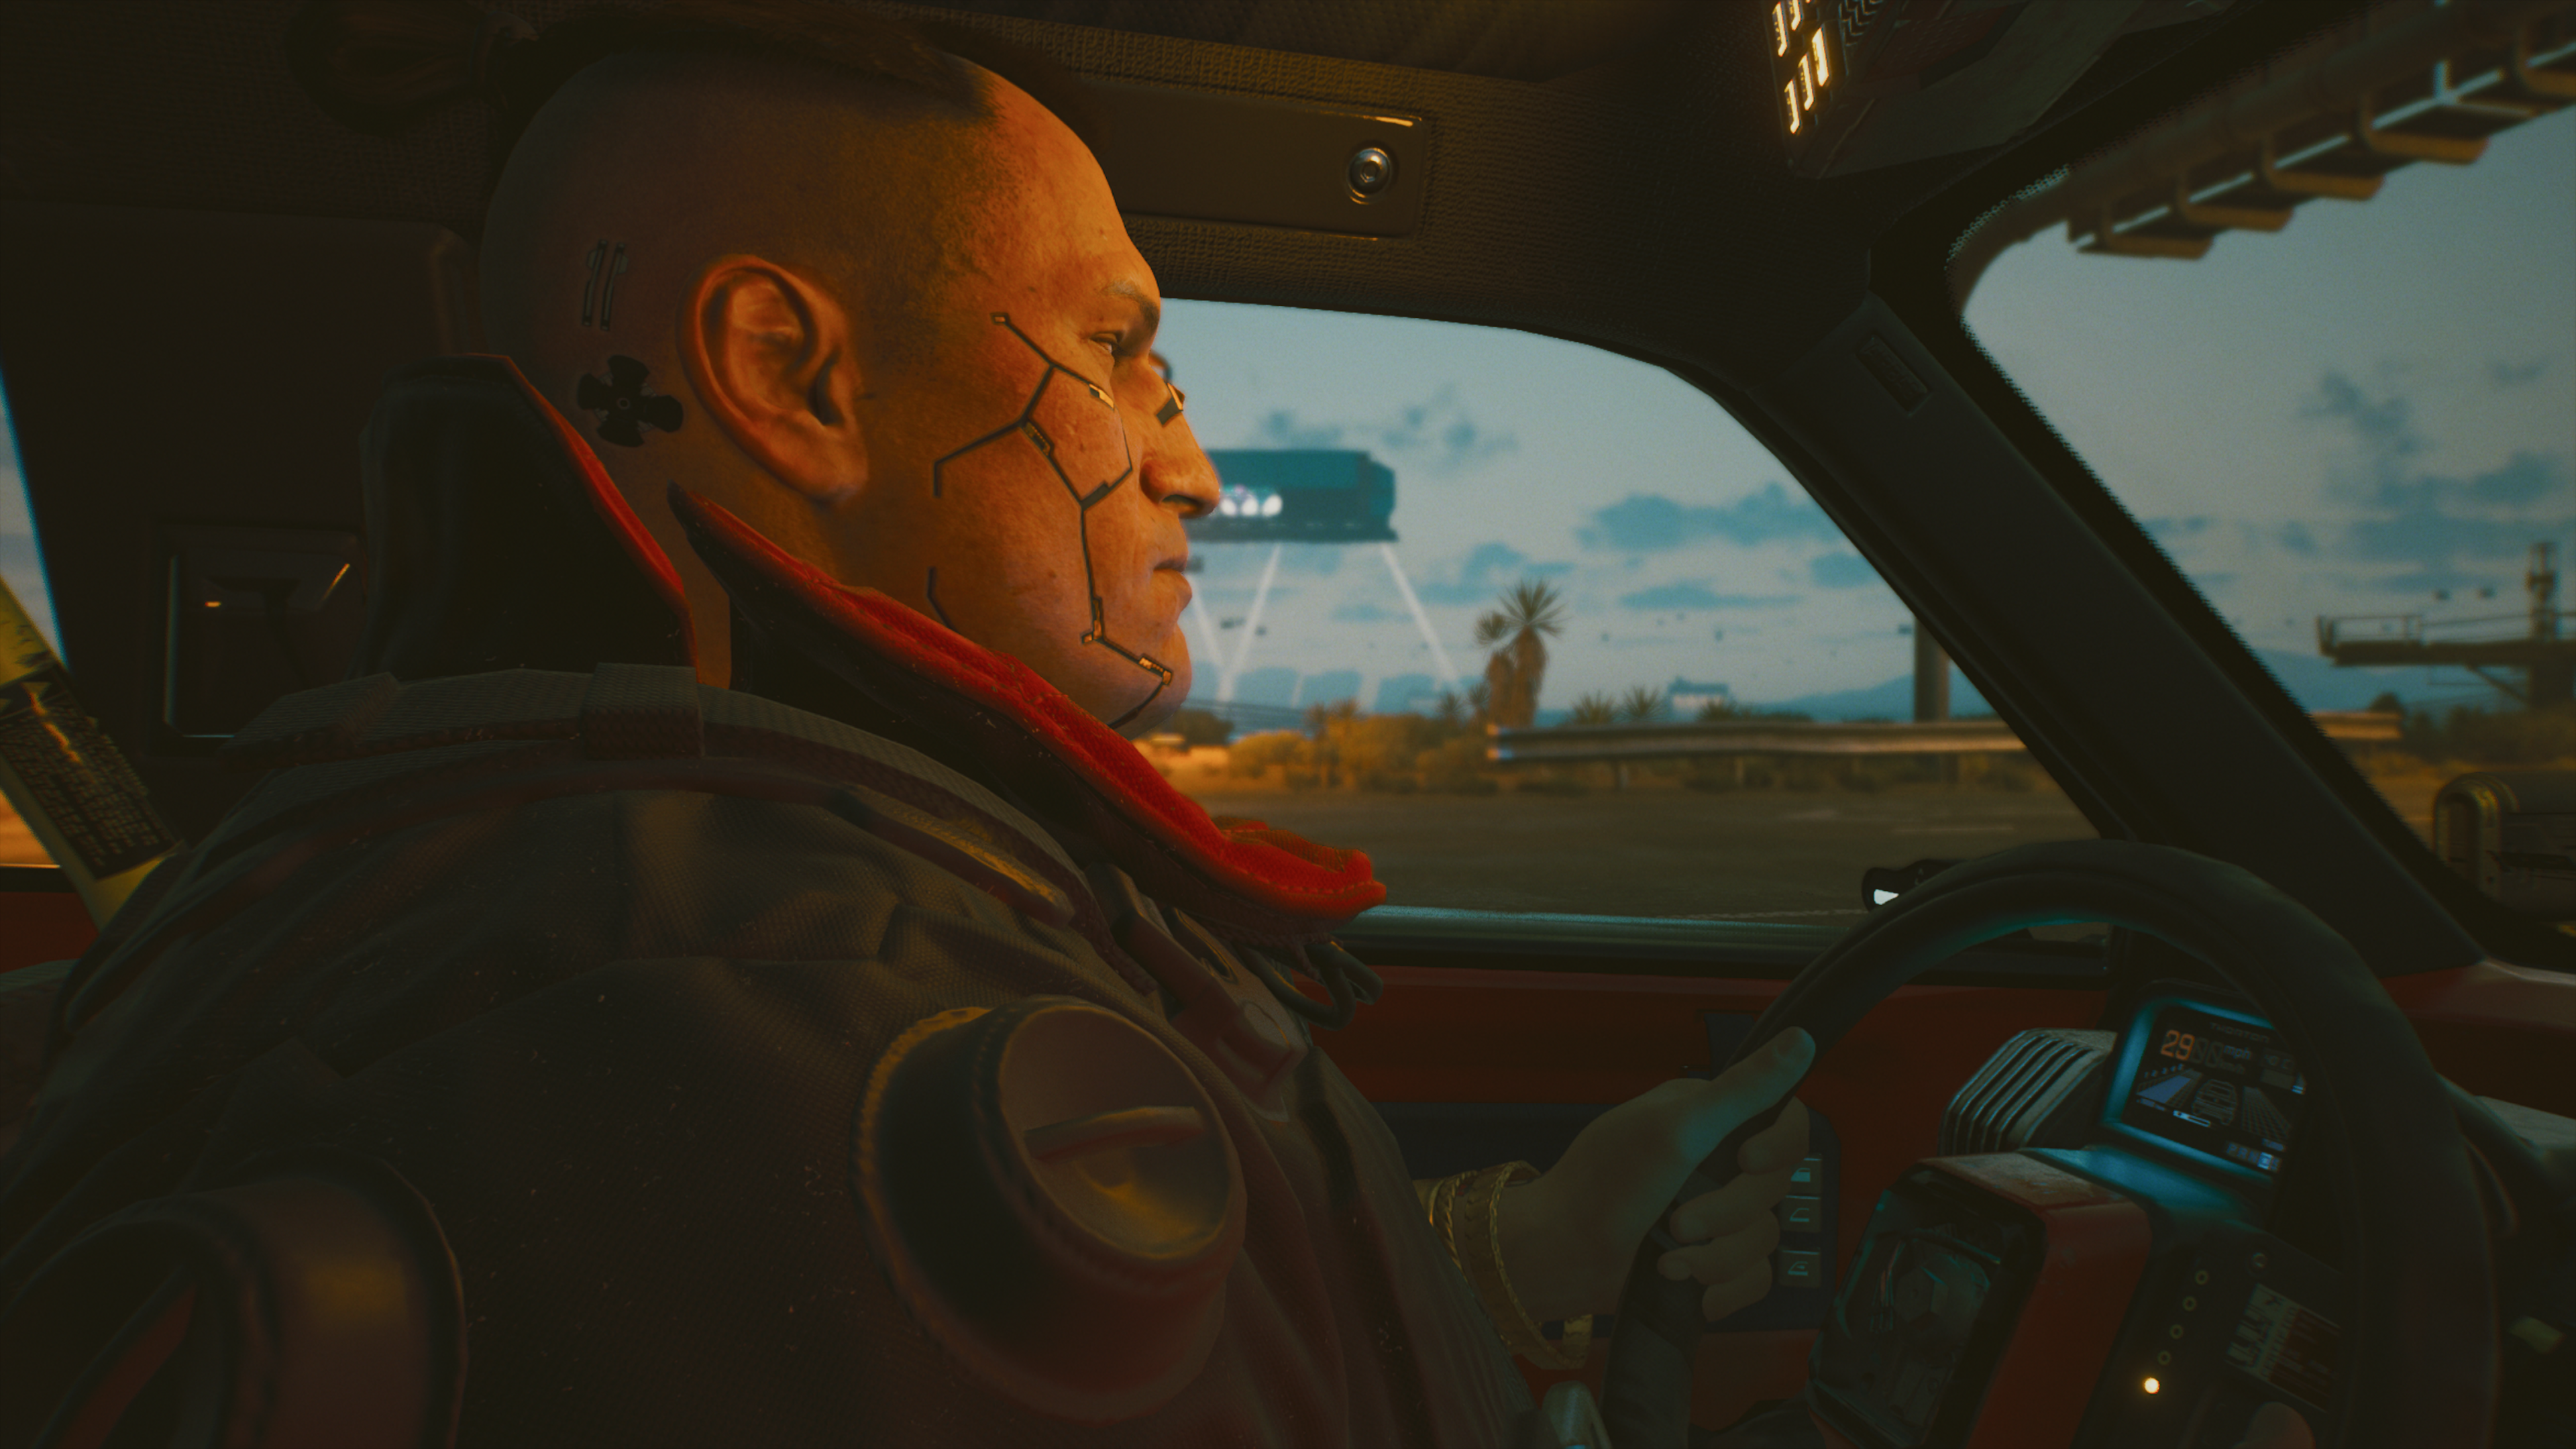 Cyberpunk 2077 driving photo